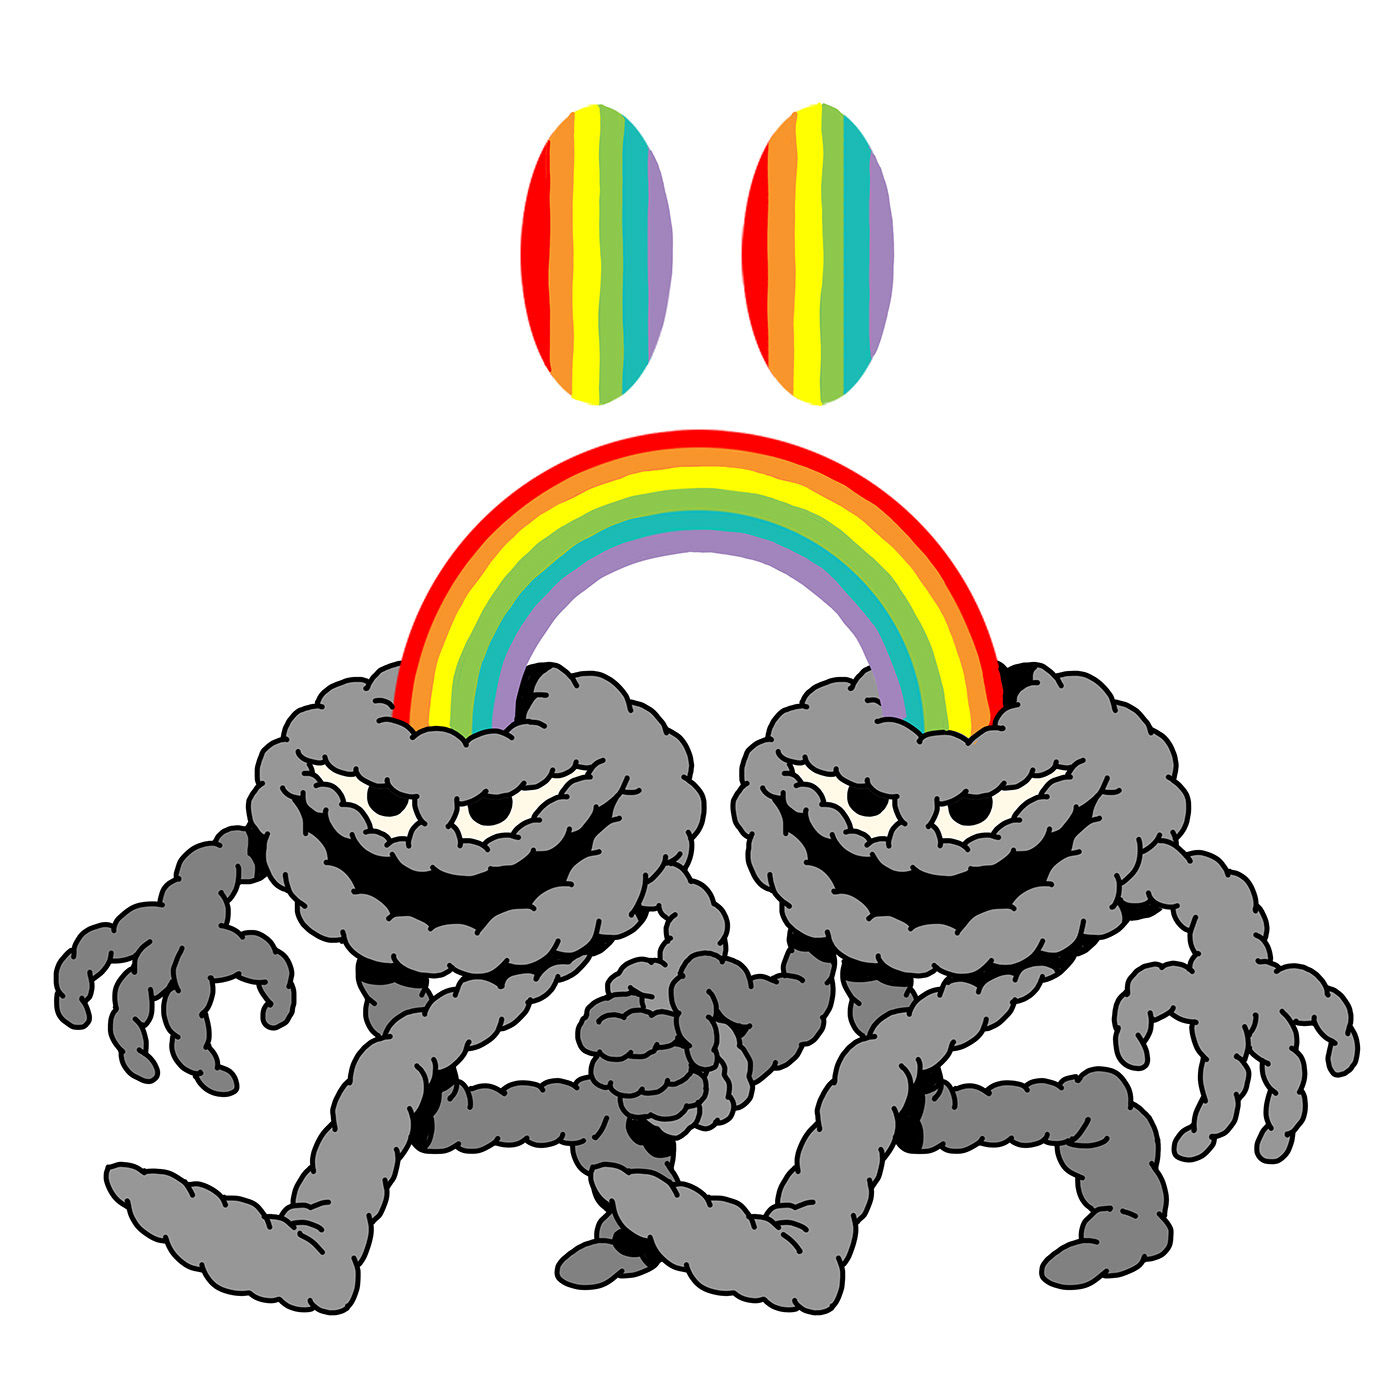 Image may contain: rainbow